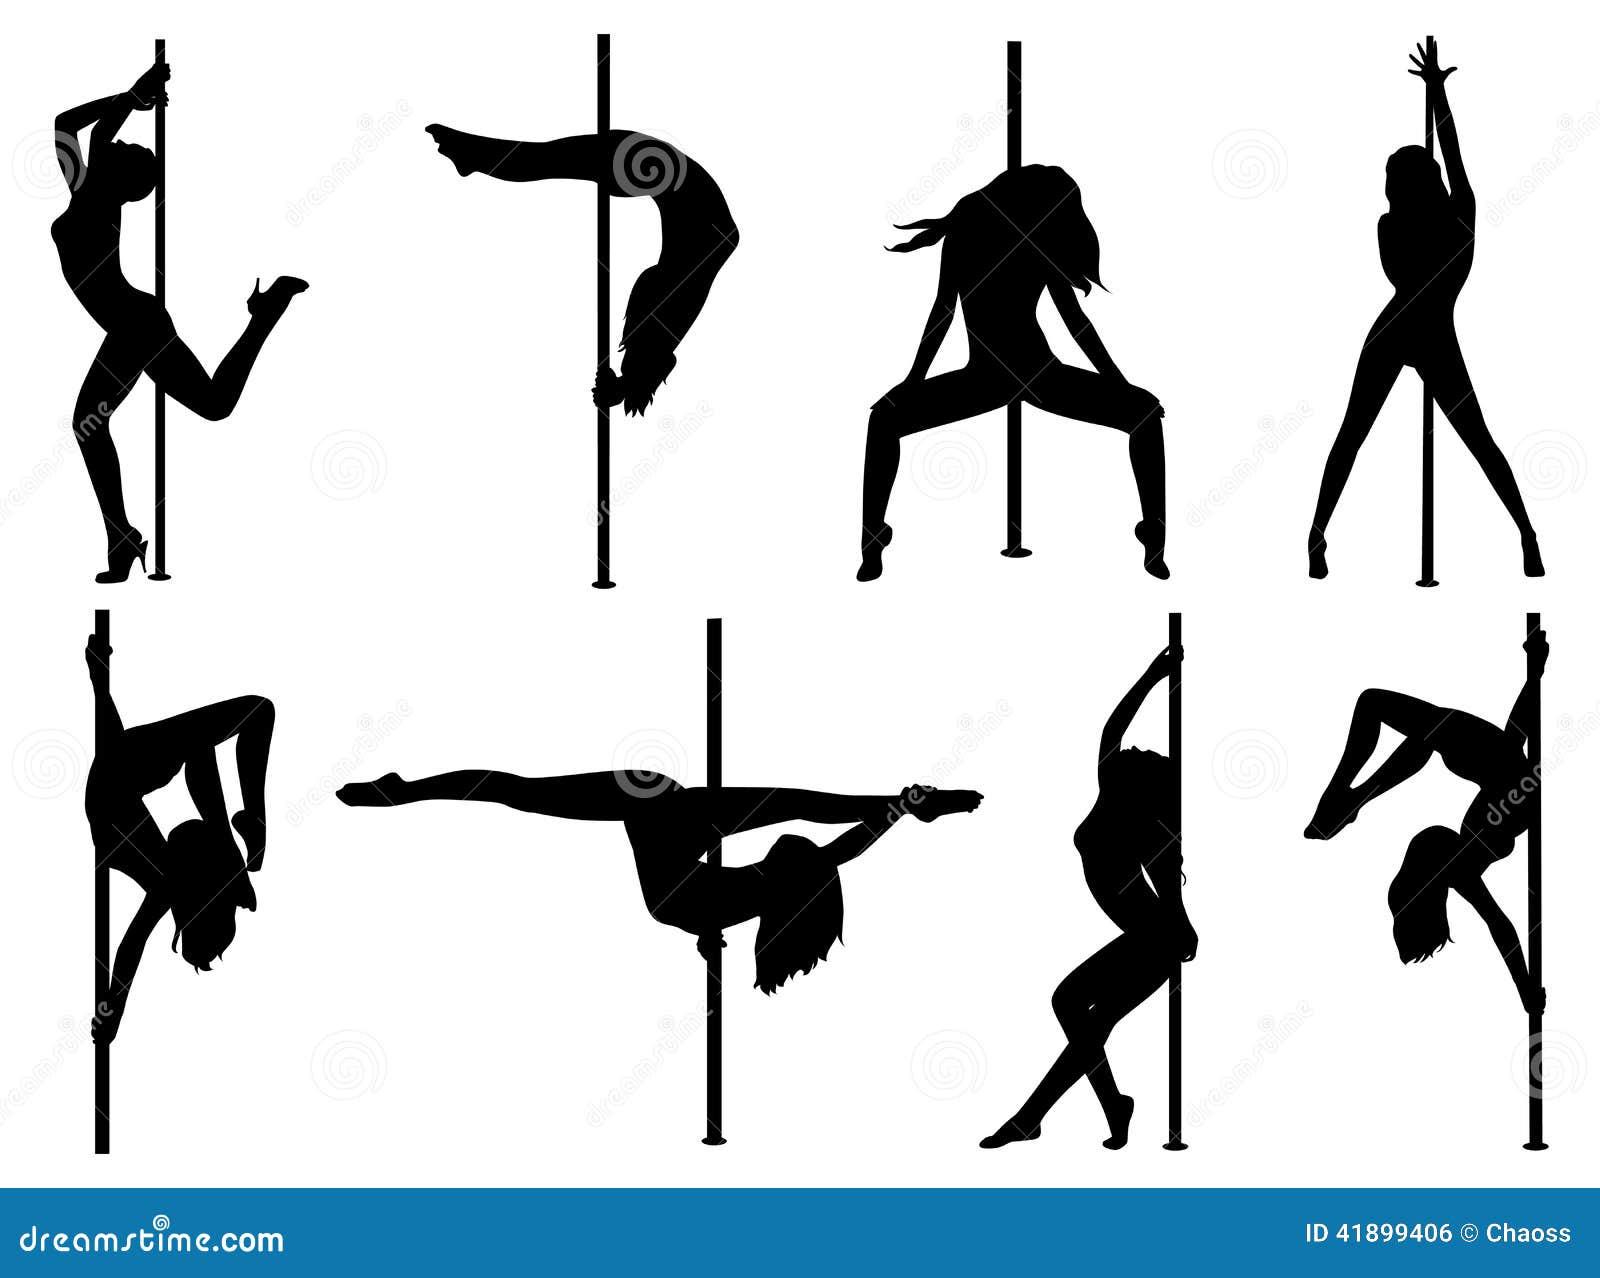 Stripper Illustration Light2sound Ldr Synth Make Pole Dance Women Silhouettes Stock Image